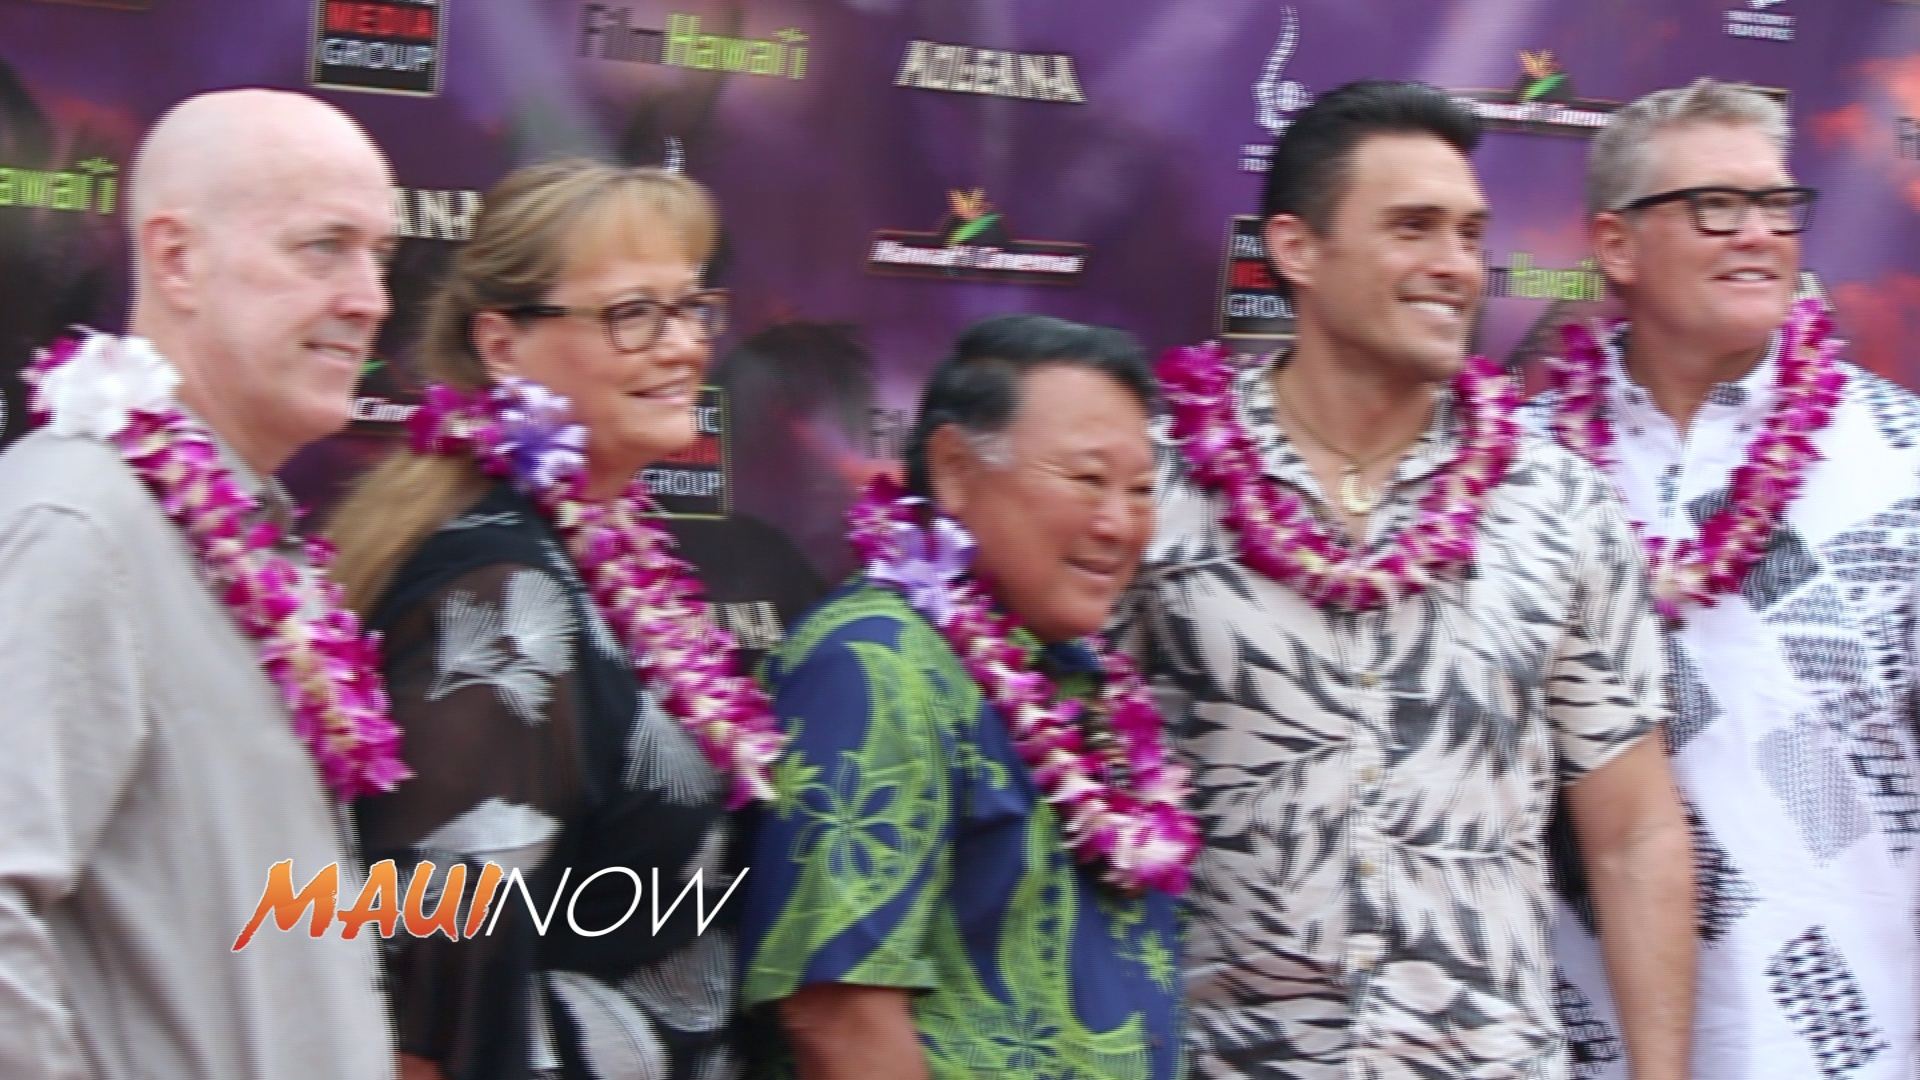 EXCLUSIVE: KULEANA's Weekend Opening on Maui